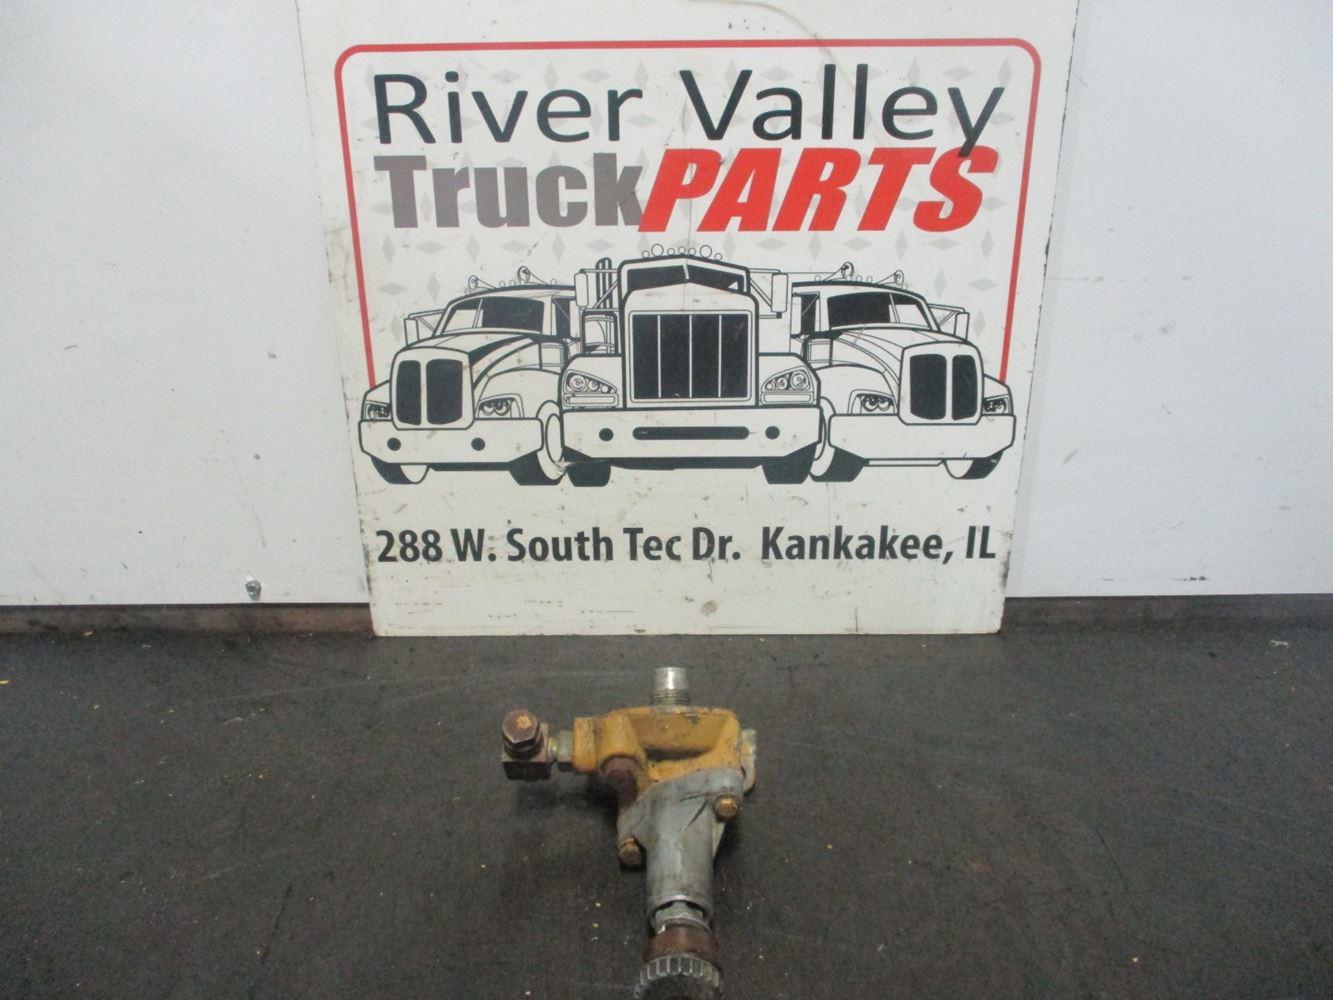 caterpillar 3126 (stock p 5850) 3126 Caterpillar Fuel Filter Truck caterpillar 3126 fuel pump f&j